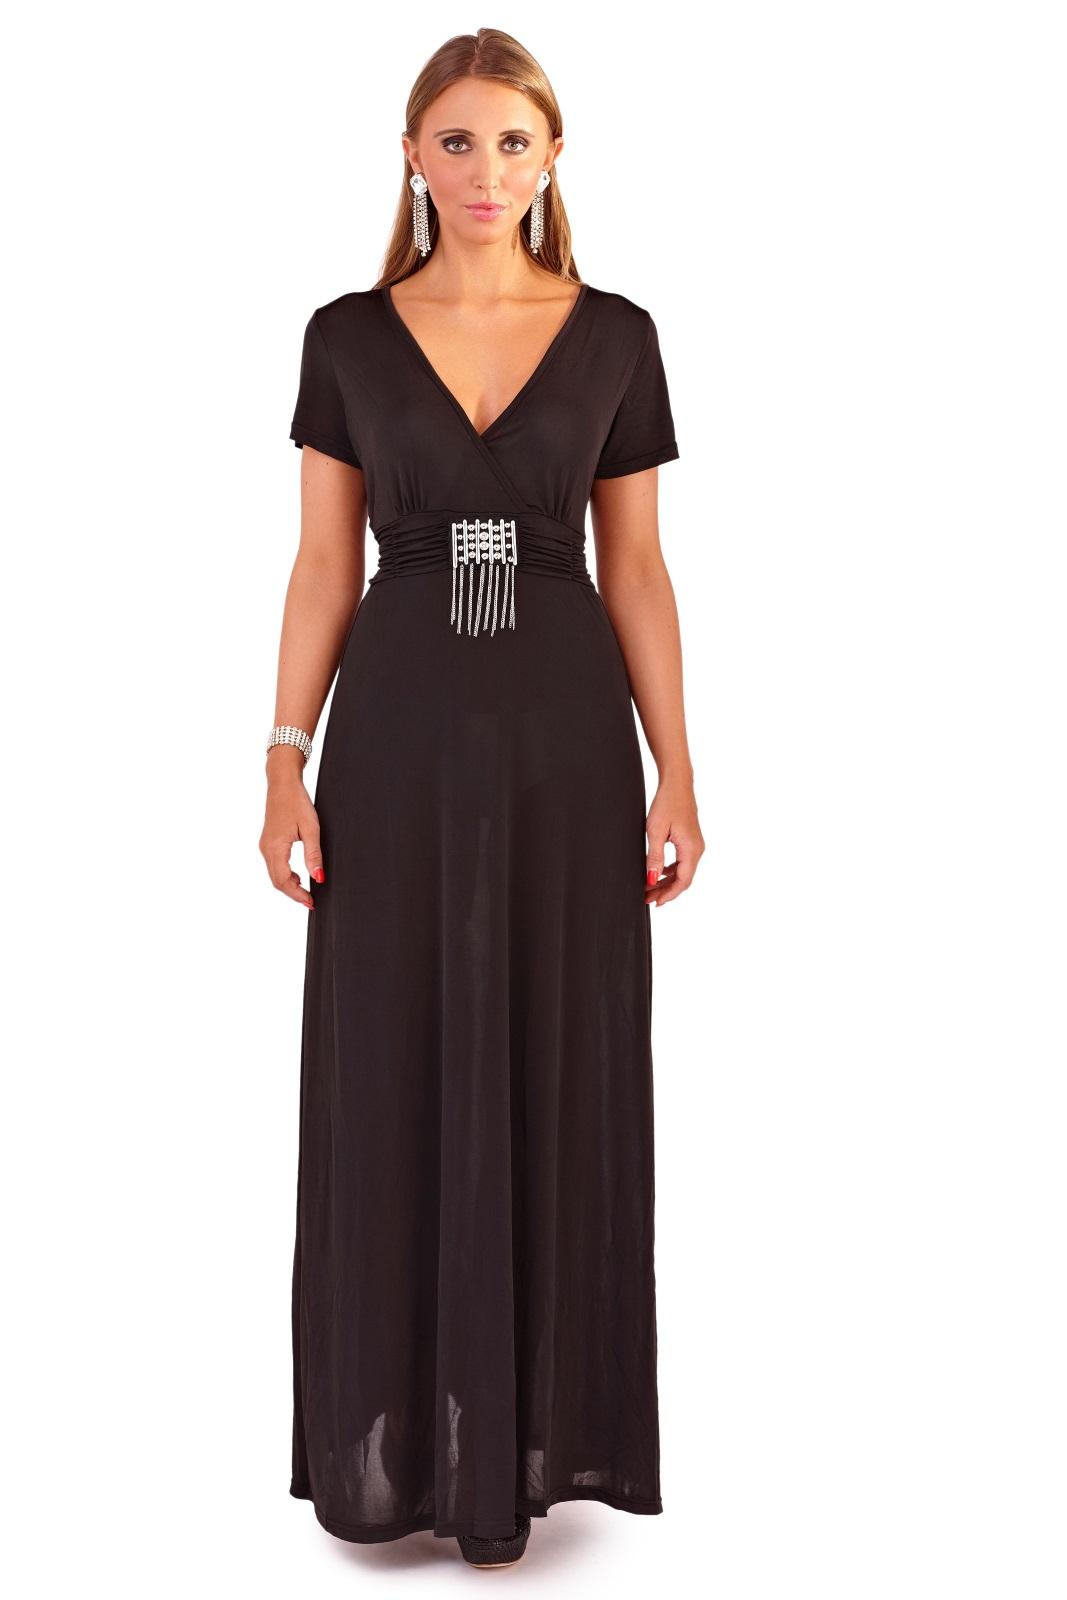 Ebay evening dresses size 16